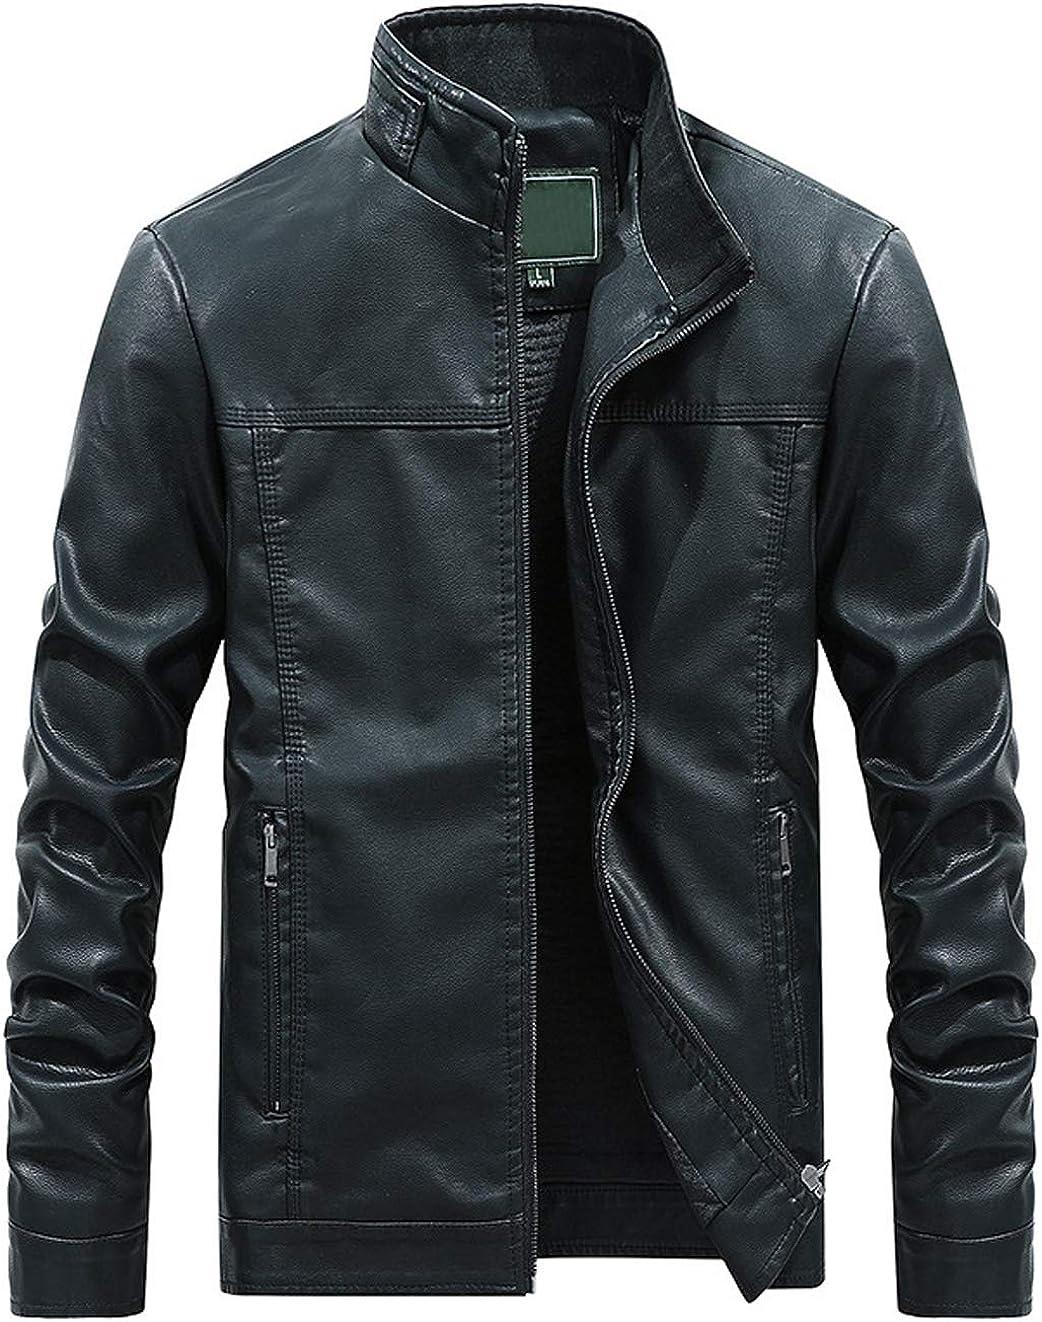 Itemnew Men's Stylish Band Collar Regular Thick Check Lined Moto Pu Leather Biker Jacket